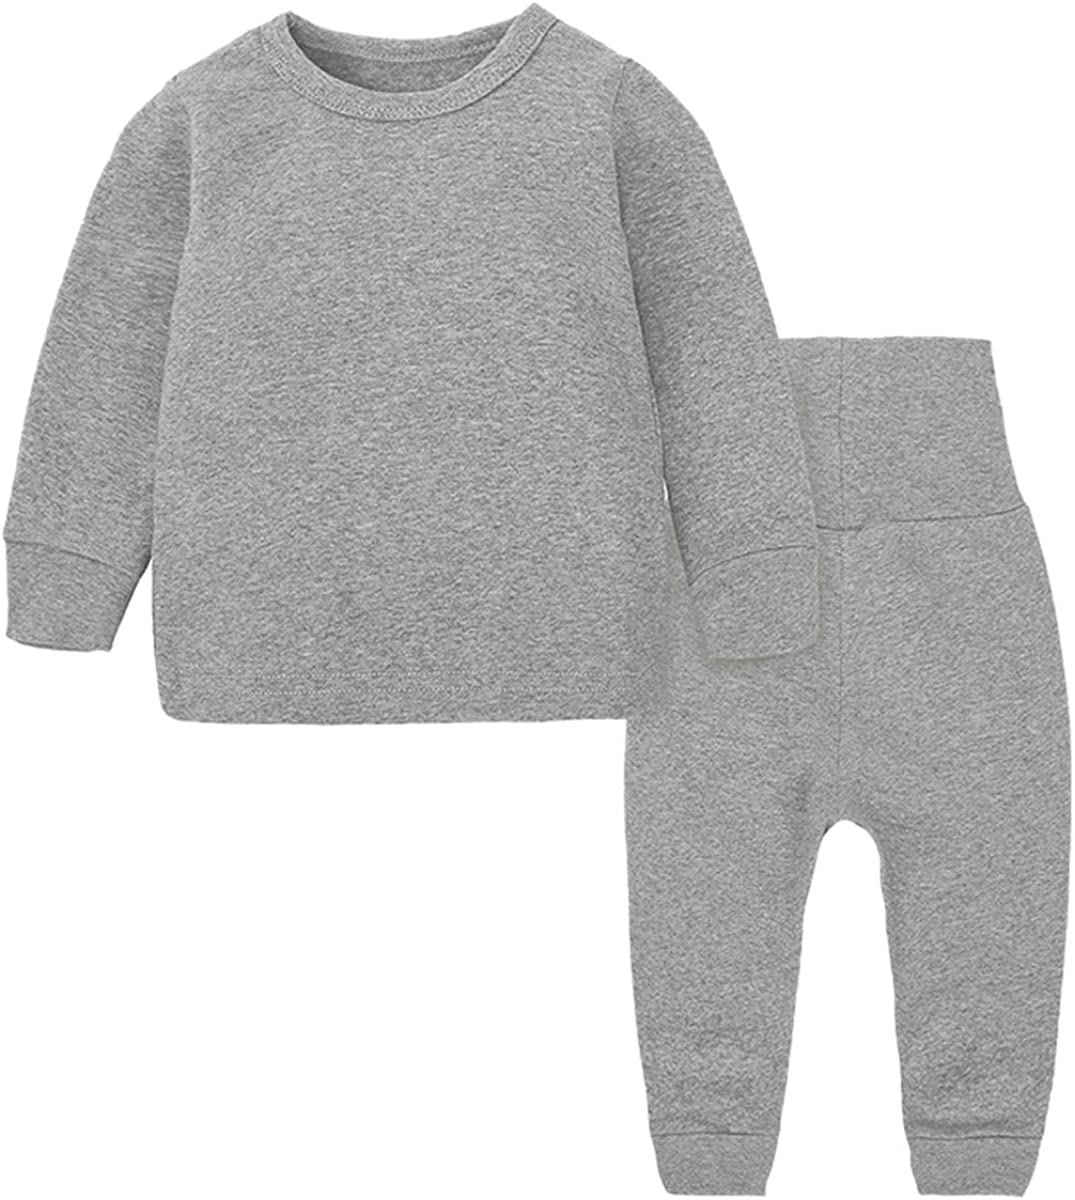 Toddler Boy's Thermal Underwear Set Base Layer Top & Bottom Set, Gray, 6-9 Months = Tag 73